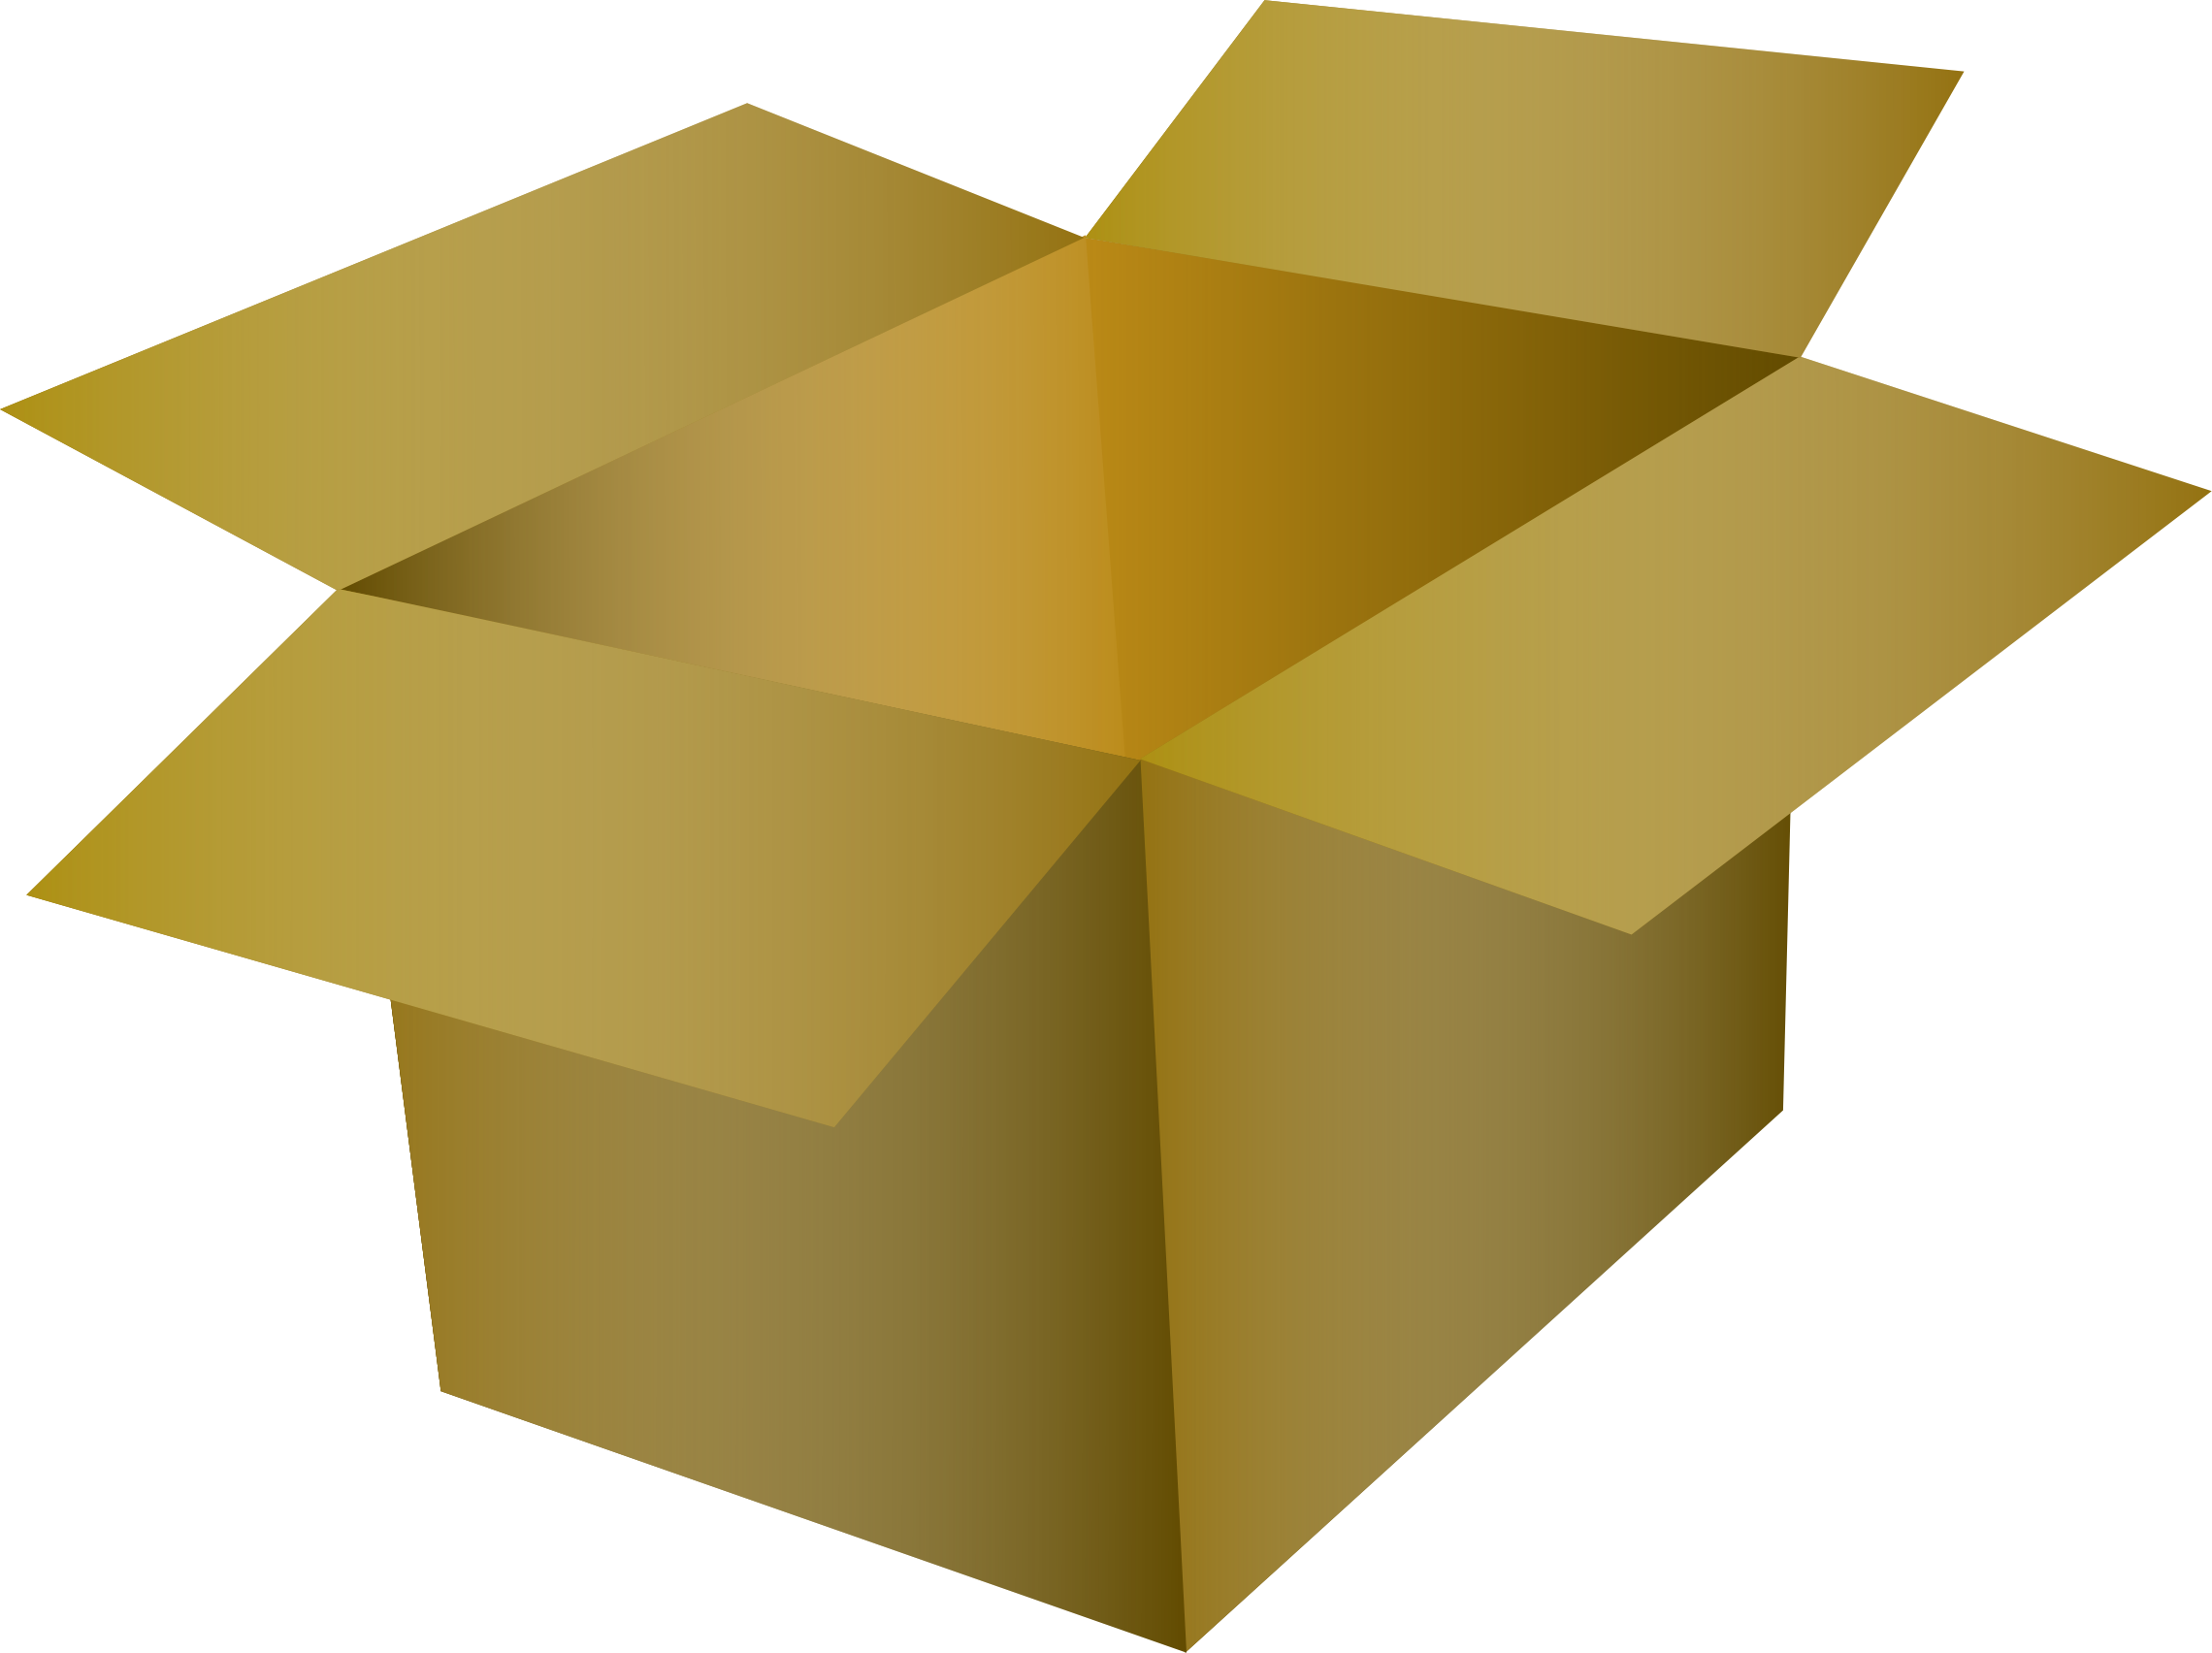 Clipart box carton box. Cardboard big image png